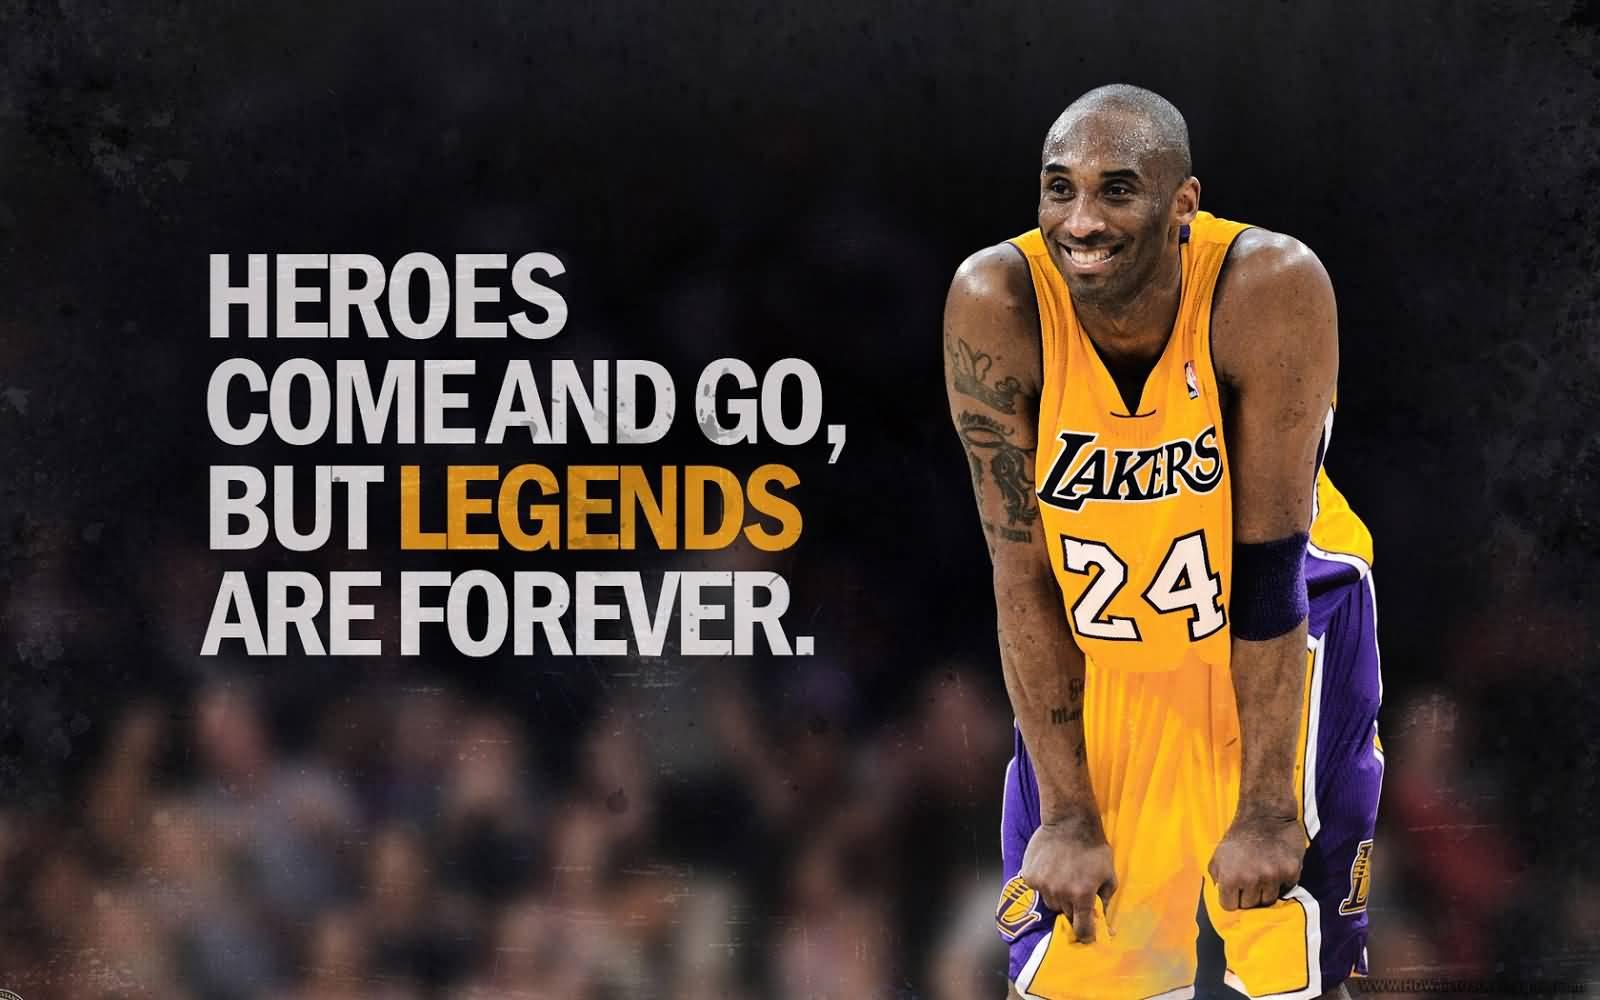 Kobe Bryant Quotes Meme Image 18